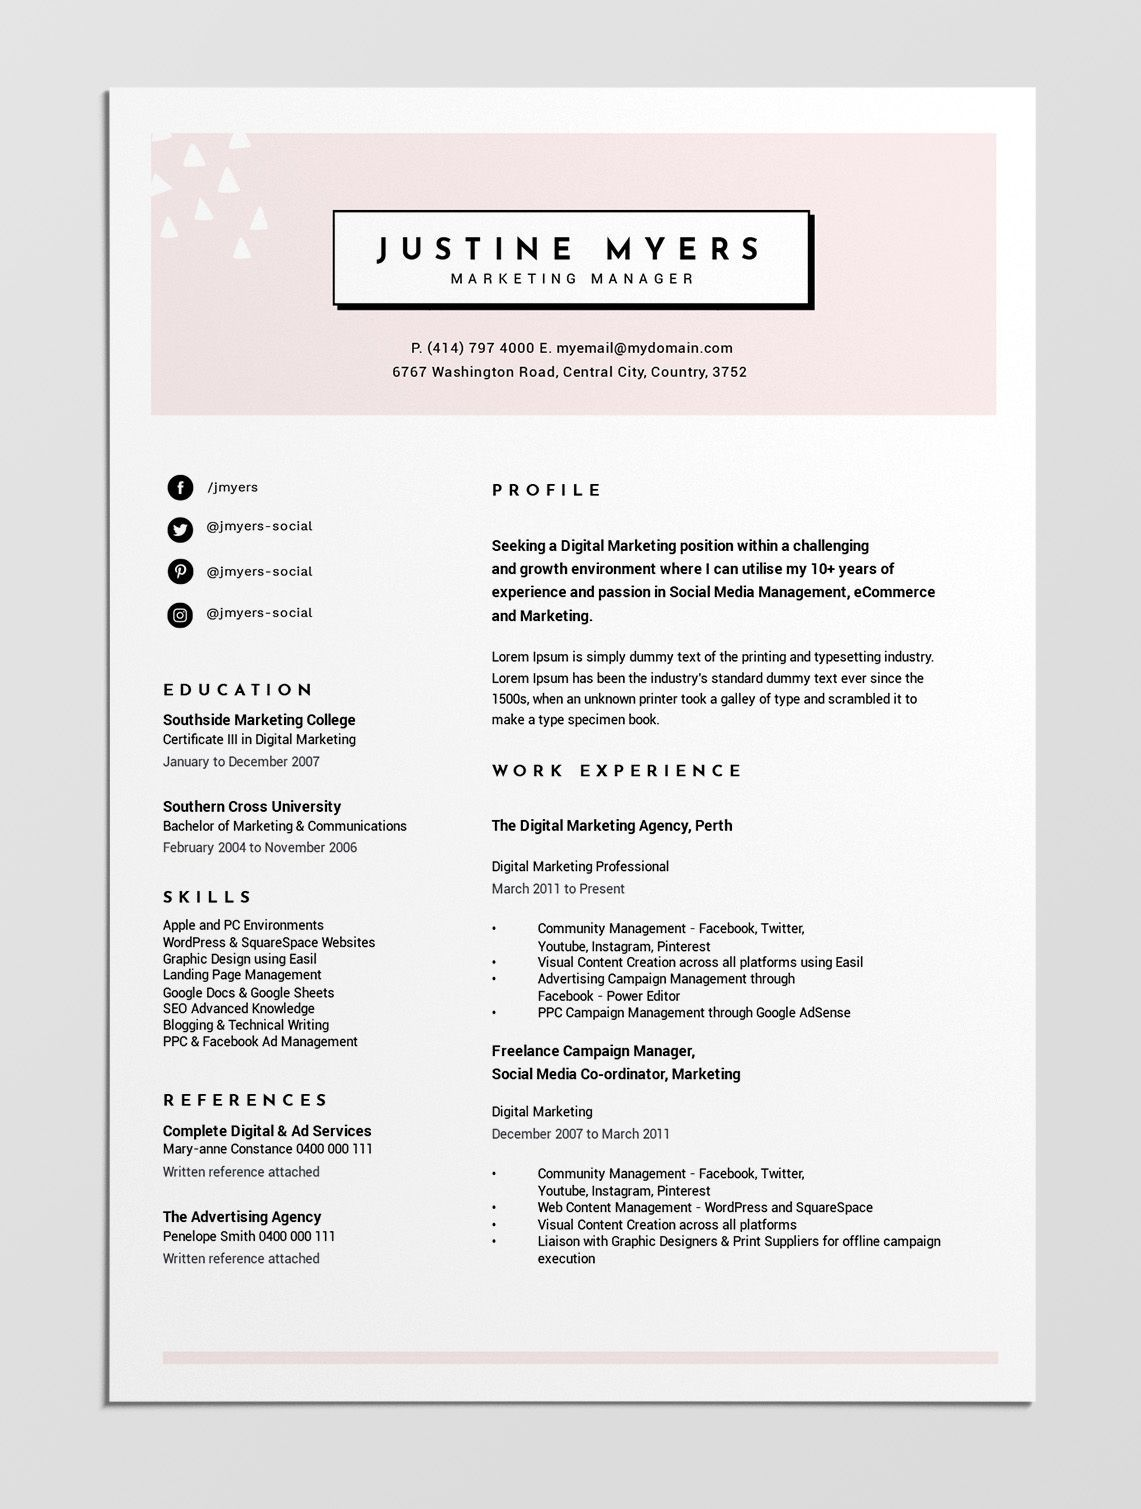 Simple Resume Template Download Simple resume template